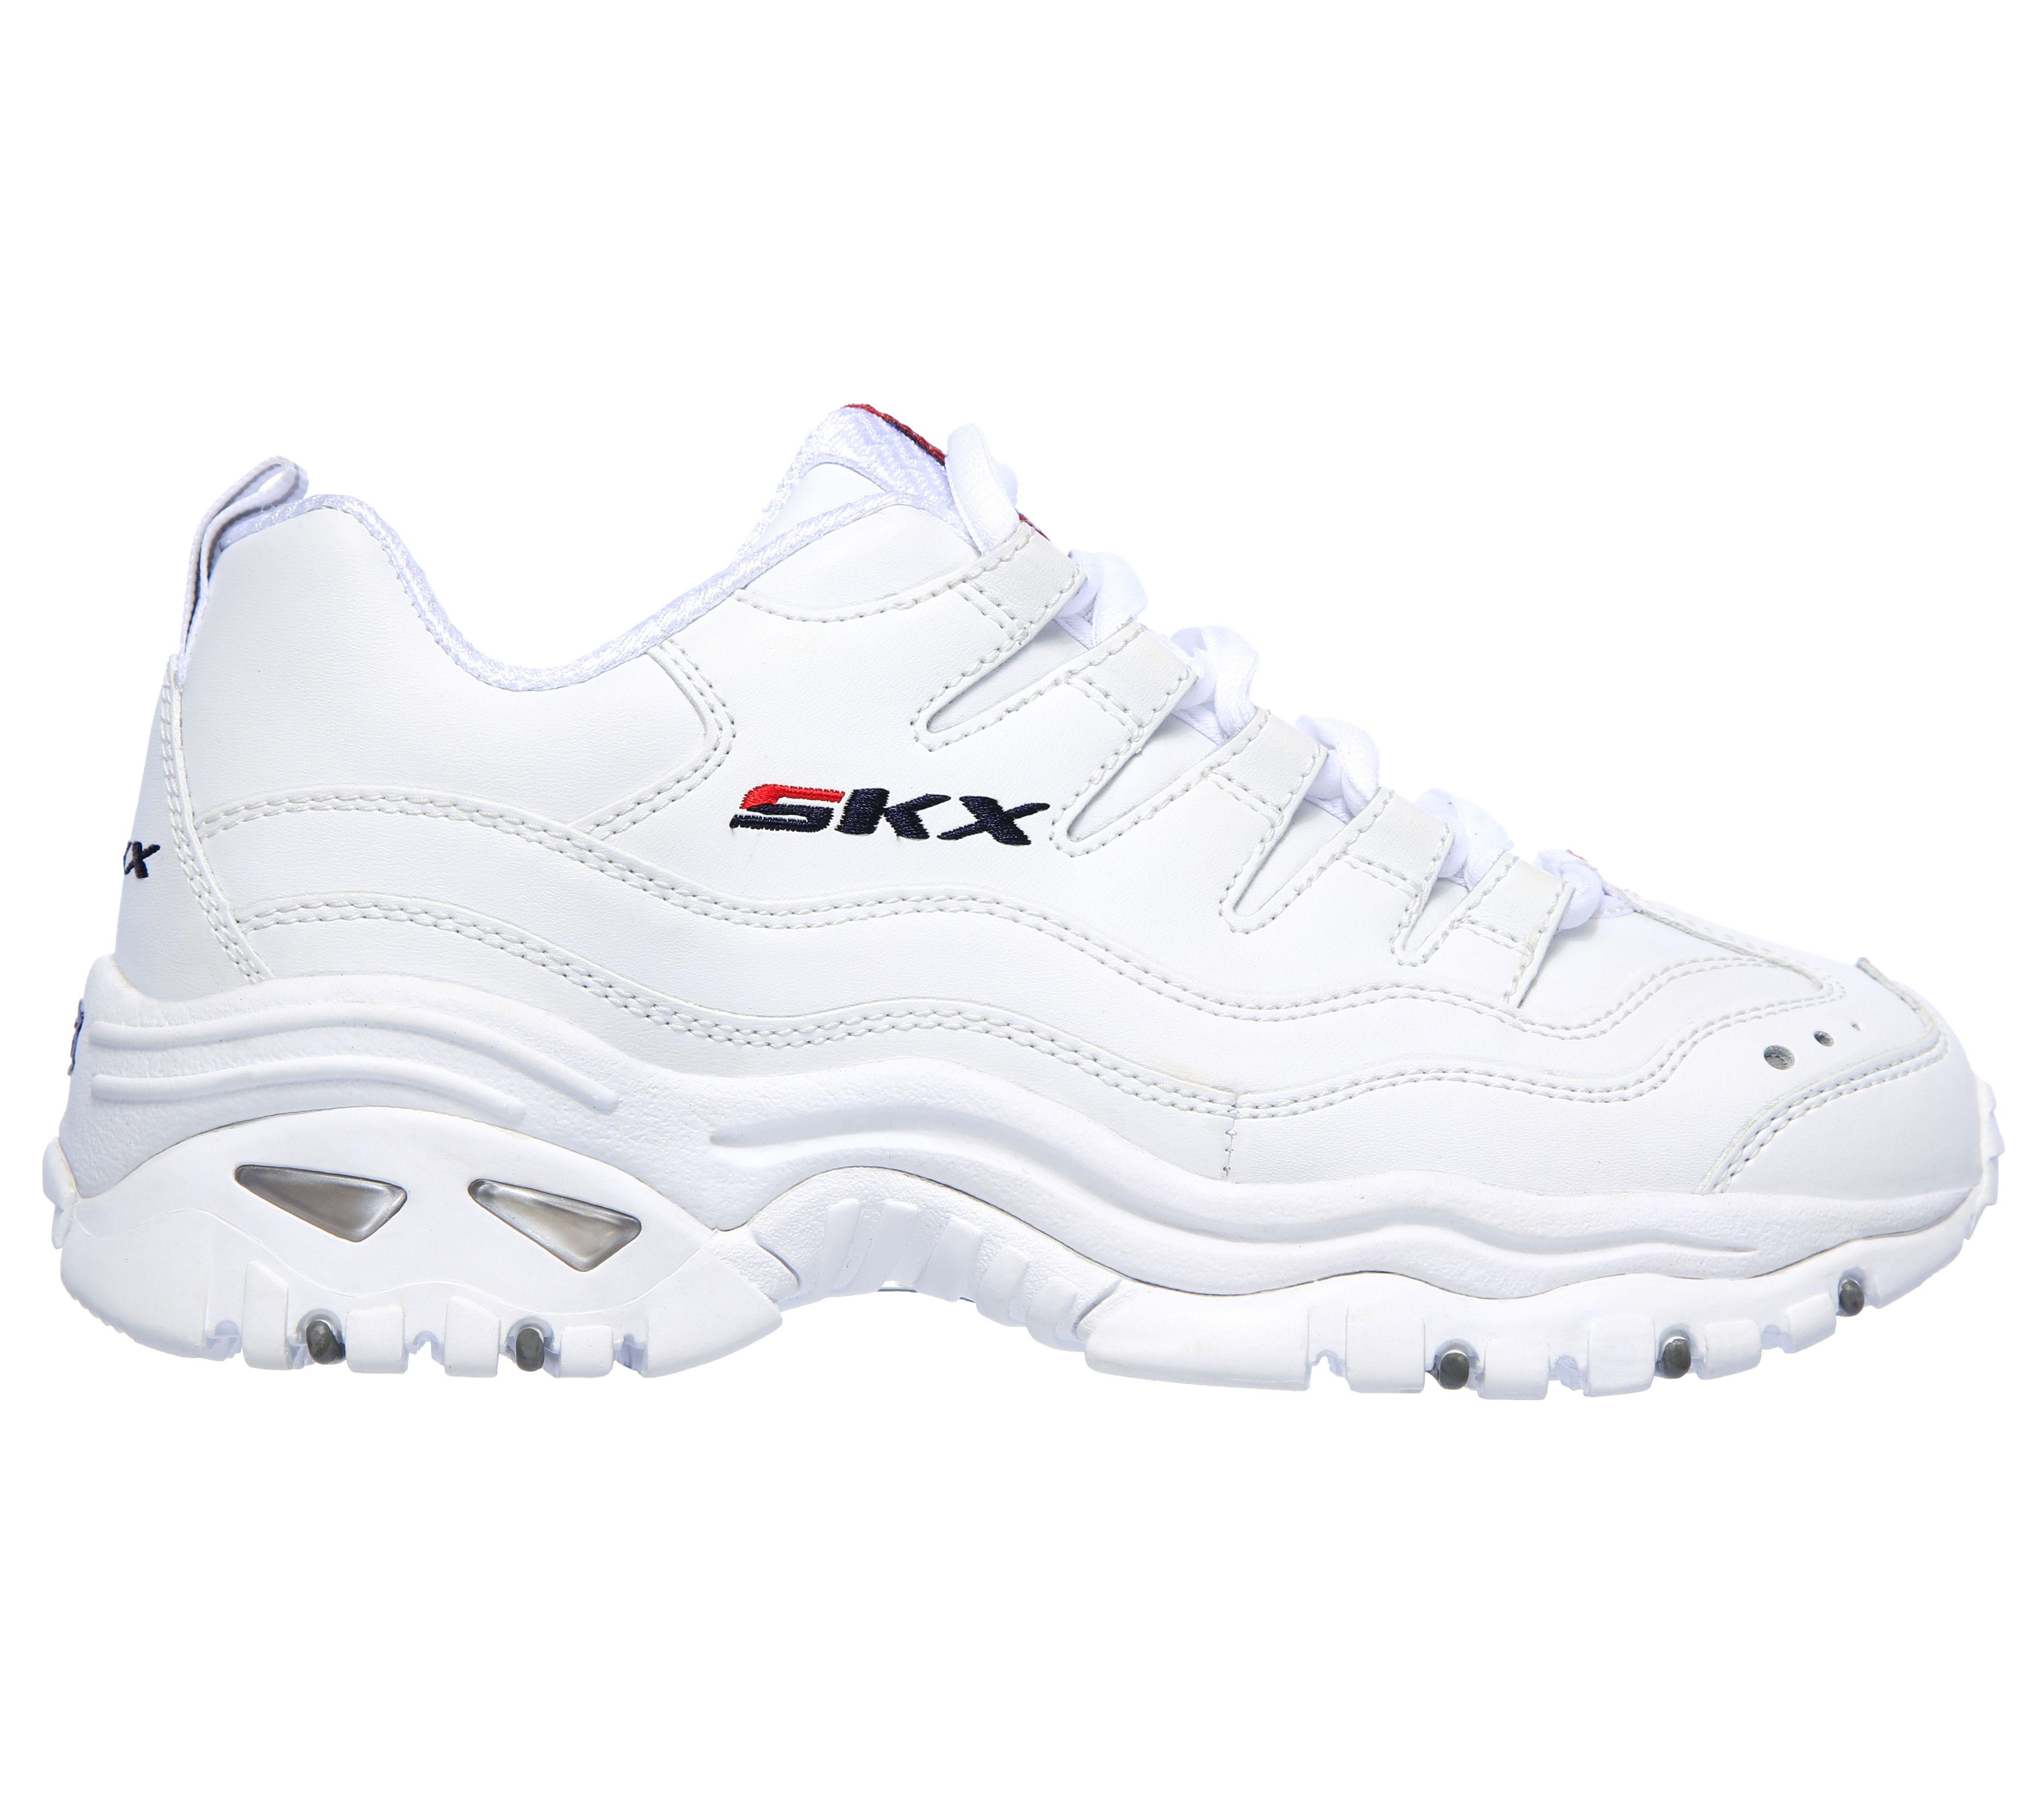 zapatillas skechers mujer verano 2019 blanco azul